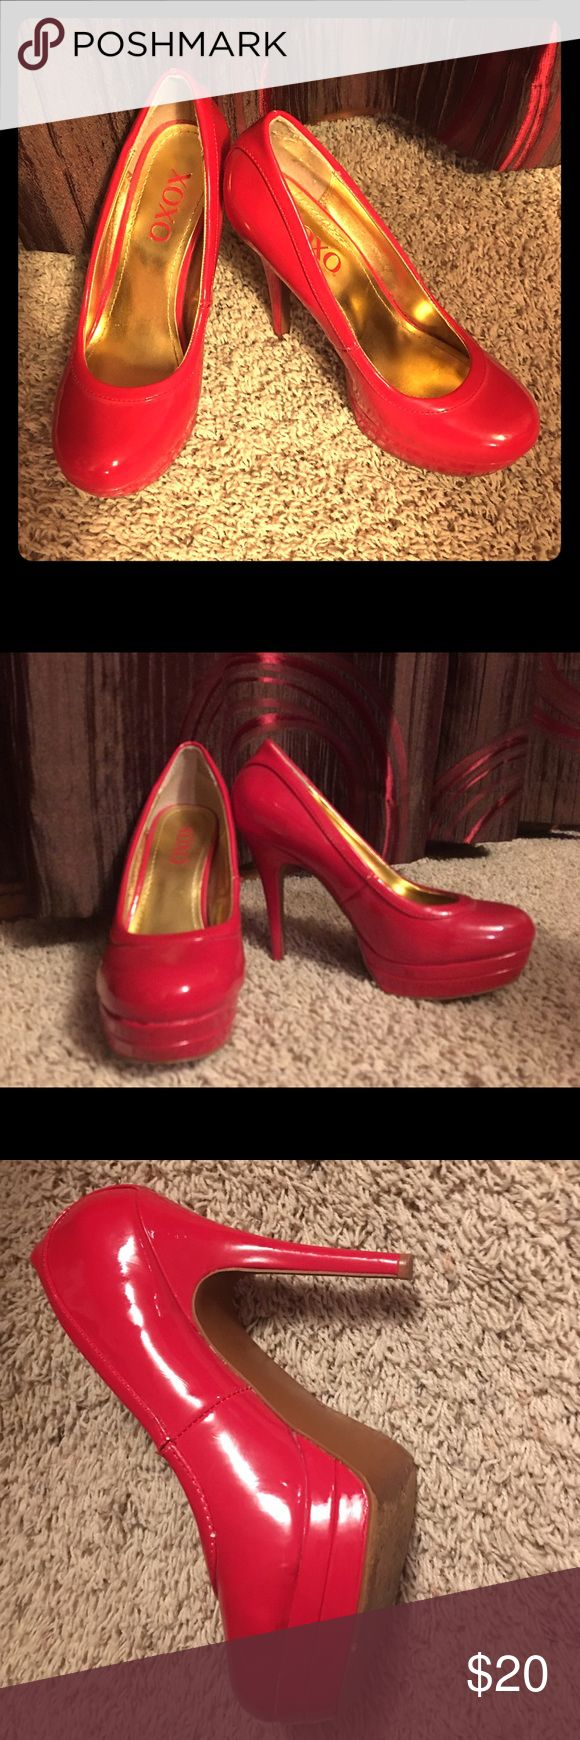 XOXO Red platform Sz 8 pumps Lightly worn red XOXO red platform pumps that POP👠 XOXO Shoes Heels